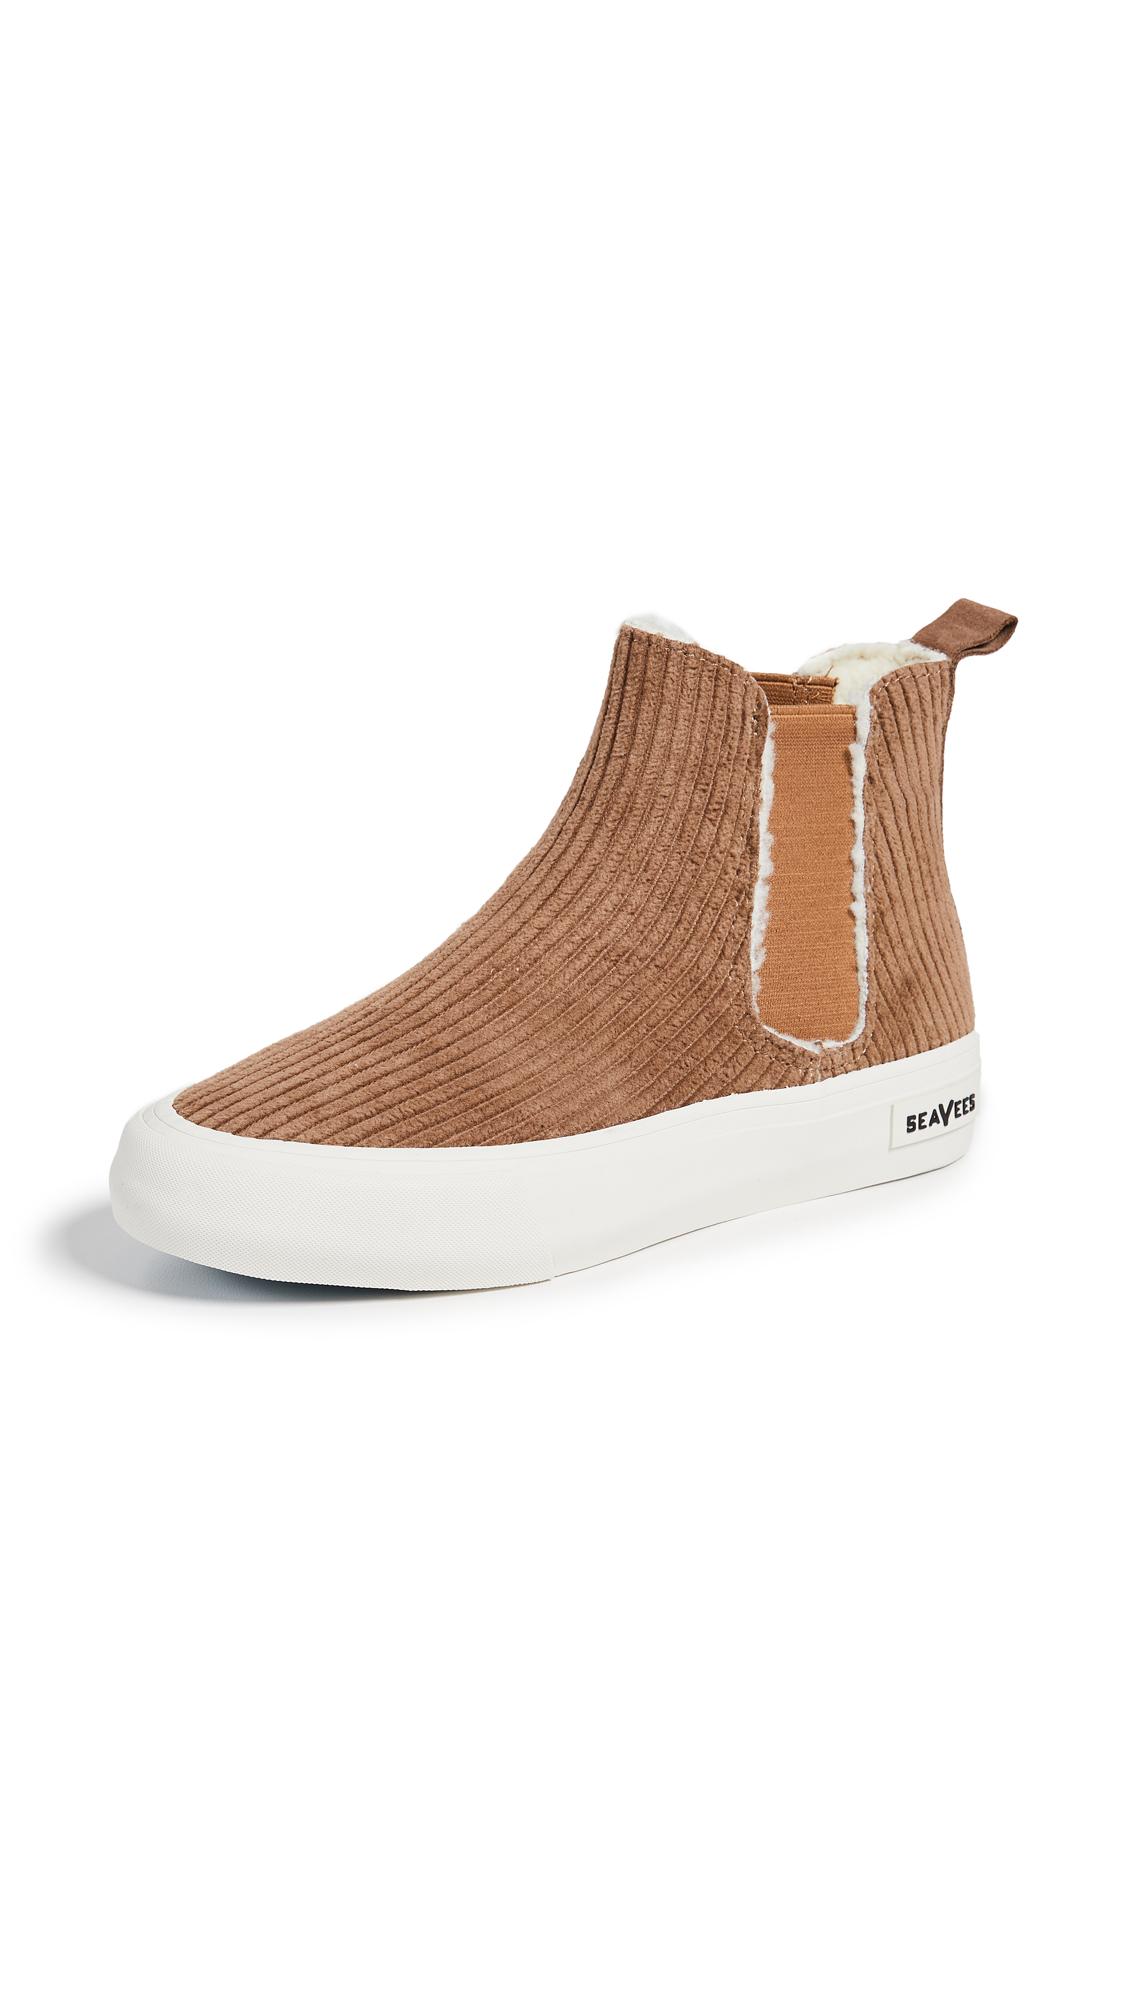 SeaVees Laguna Chelsea Boots - Whisky